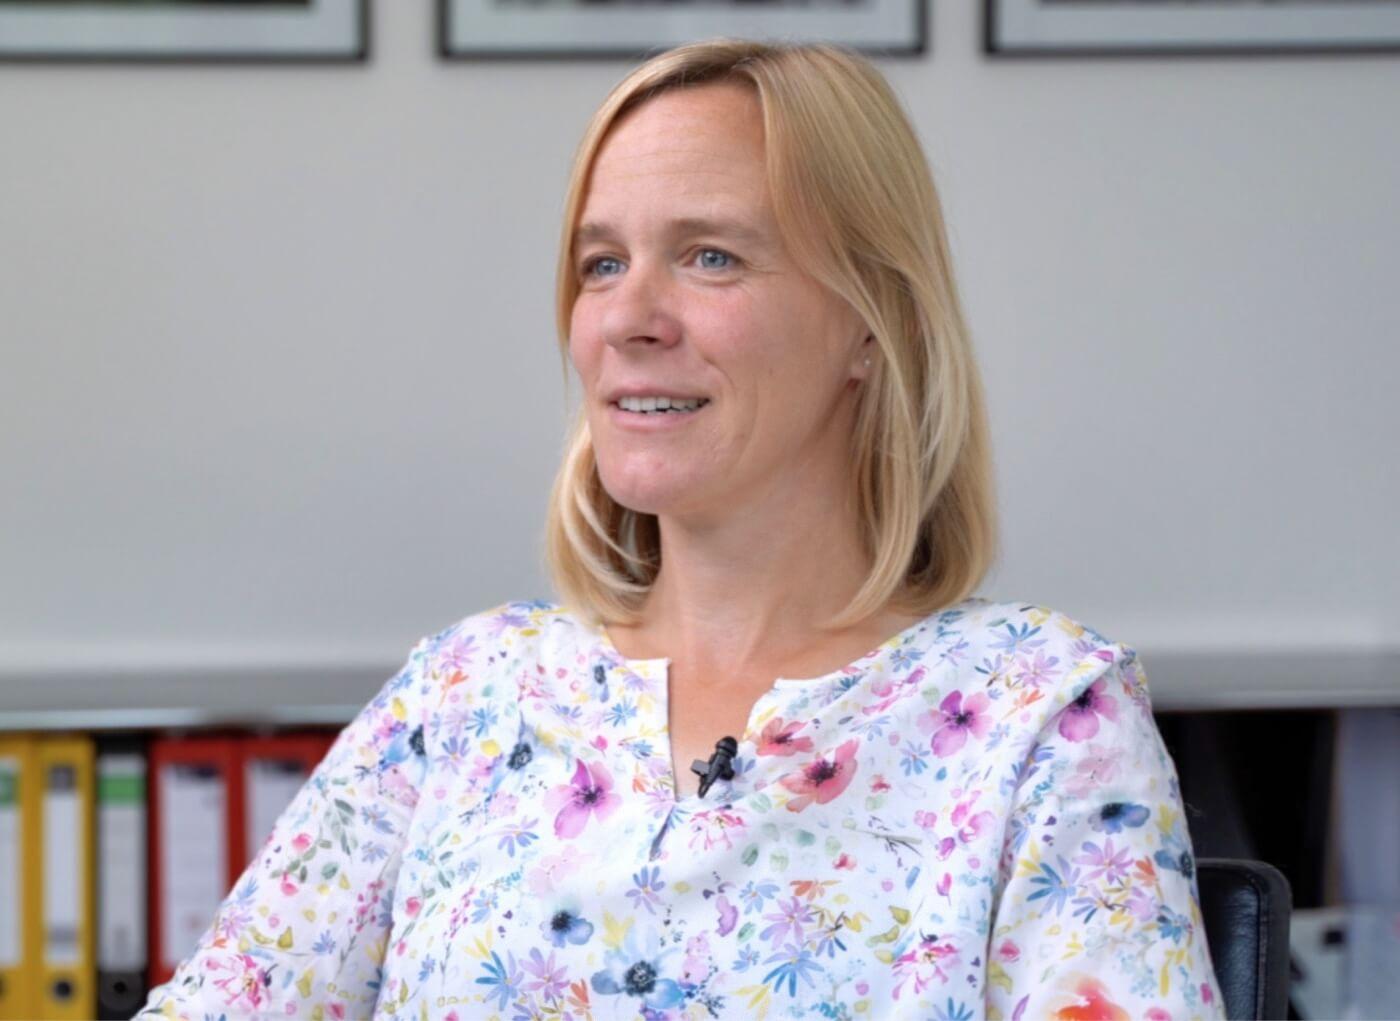 Monika Rieger